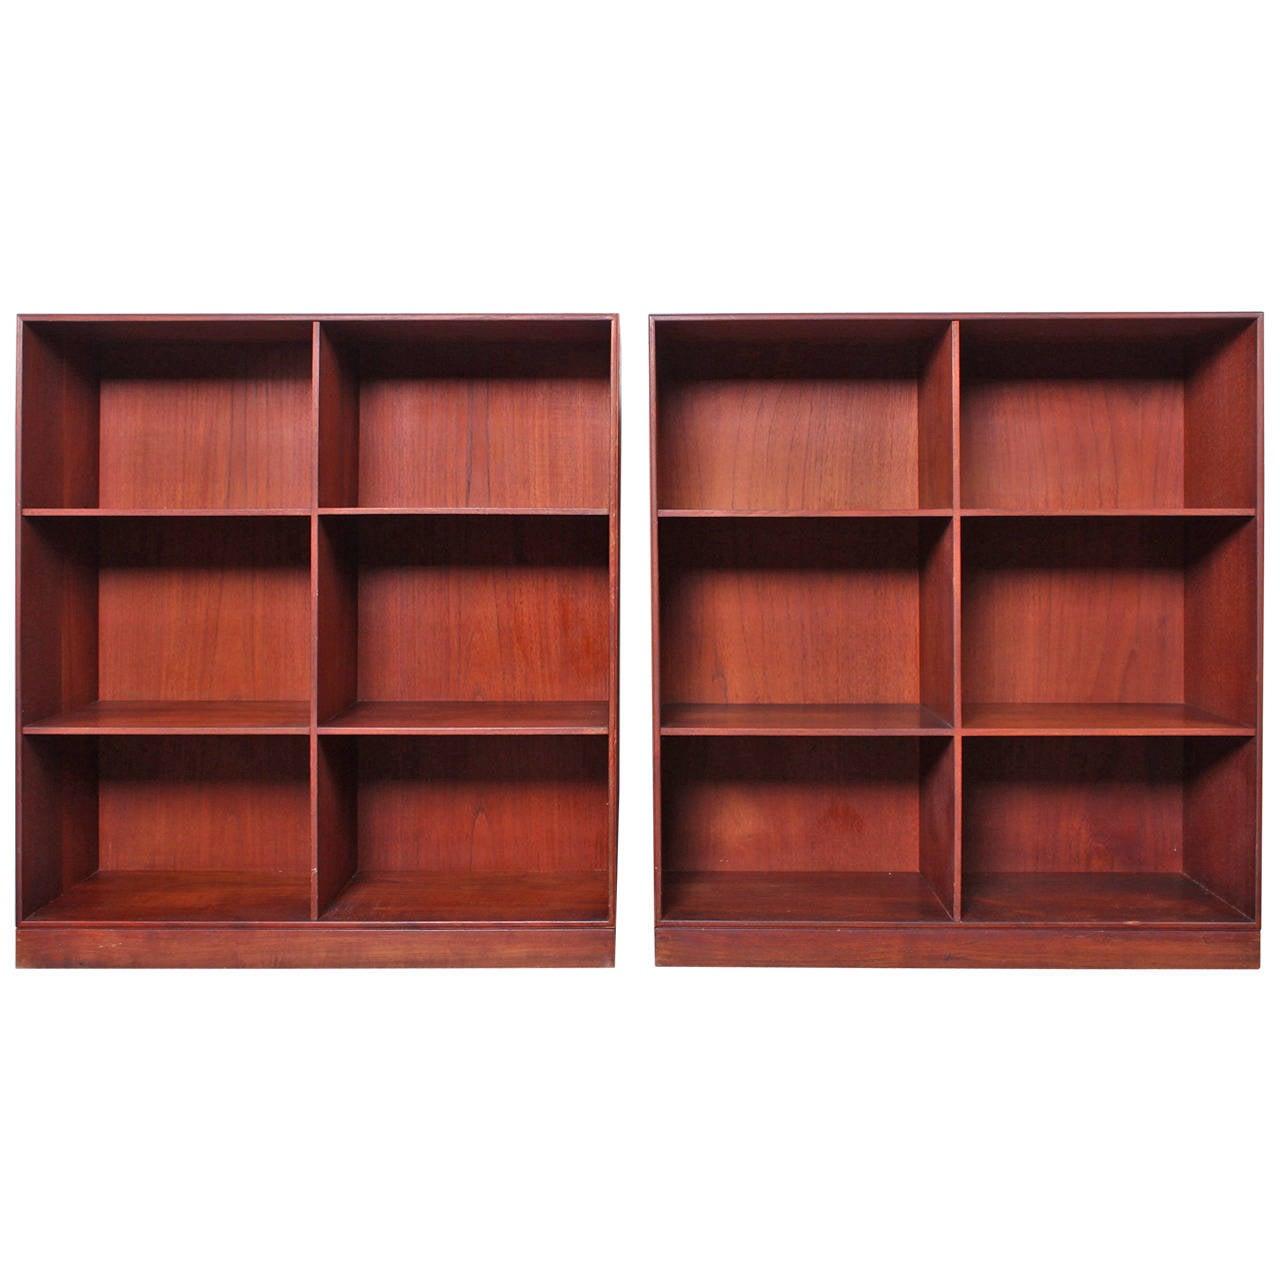 Pair of Bookcases by Mogens Koch for Rud. Rasmussens Snedkerier